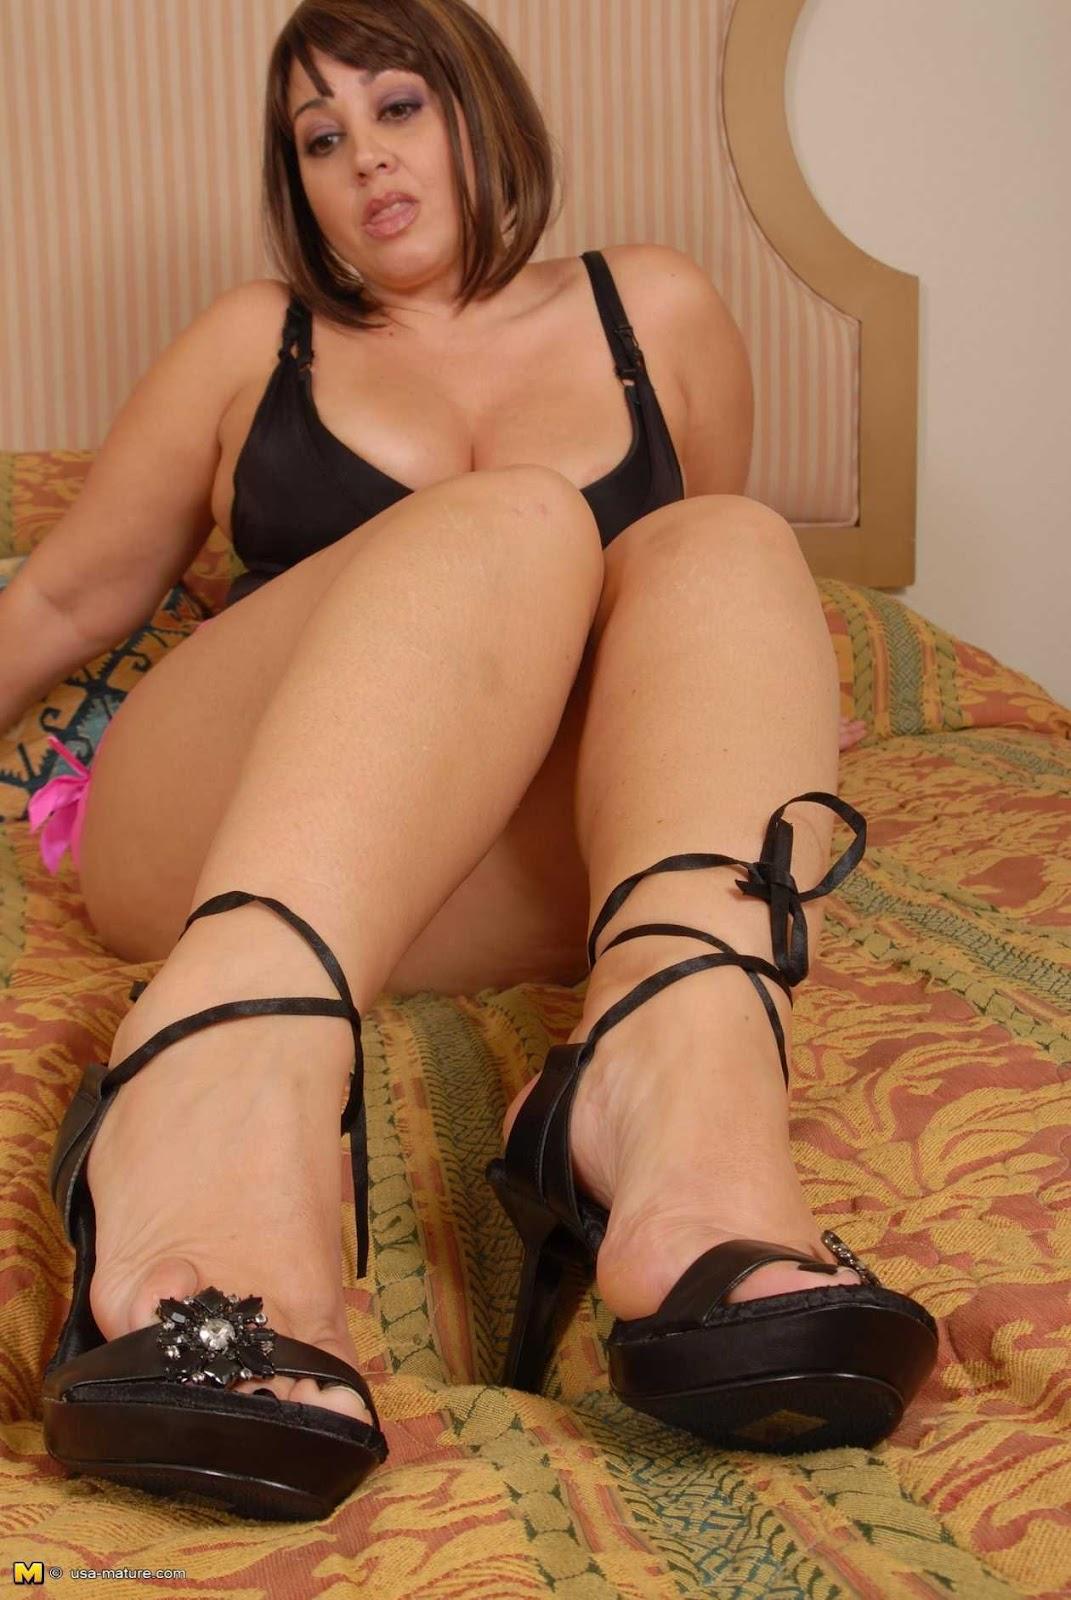 chubby girls feet